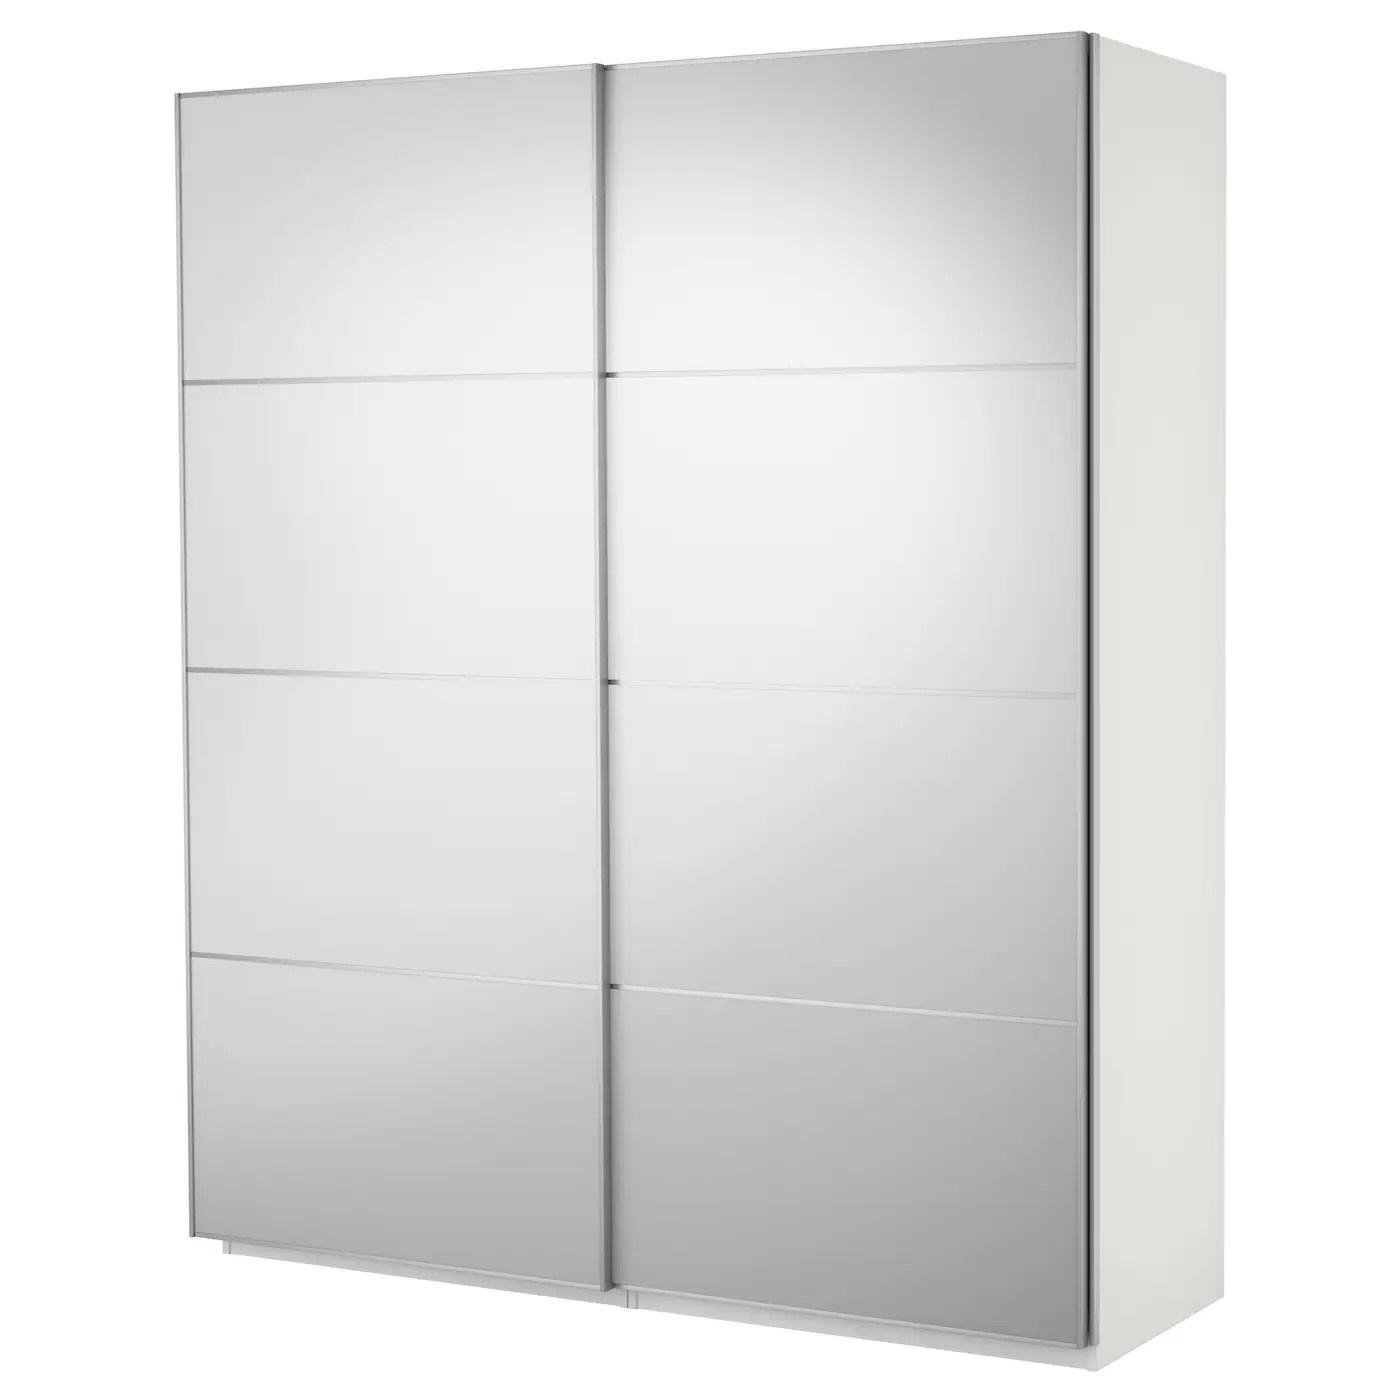 Pax Wardrobe With Sliding Doors White Auli Mirror Glass